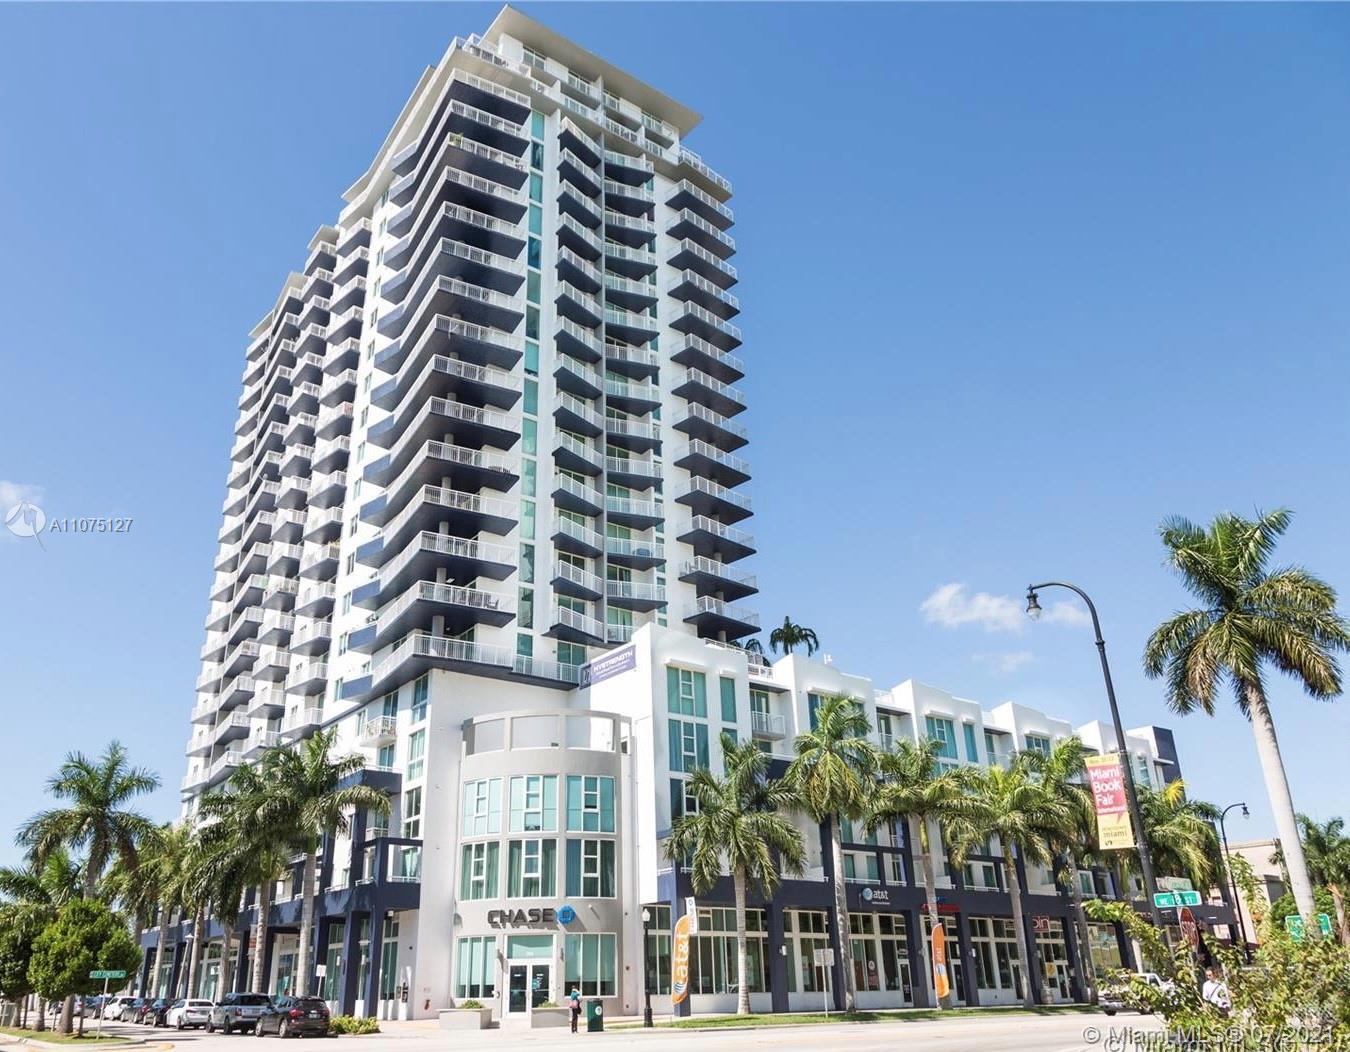 1800 Biscayne Plaza #1108 - 275 NE 18th St #1108, Miami, FL 33132